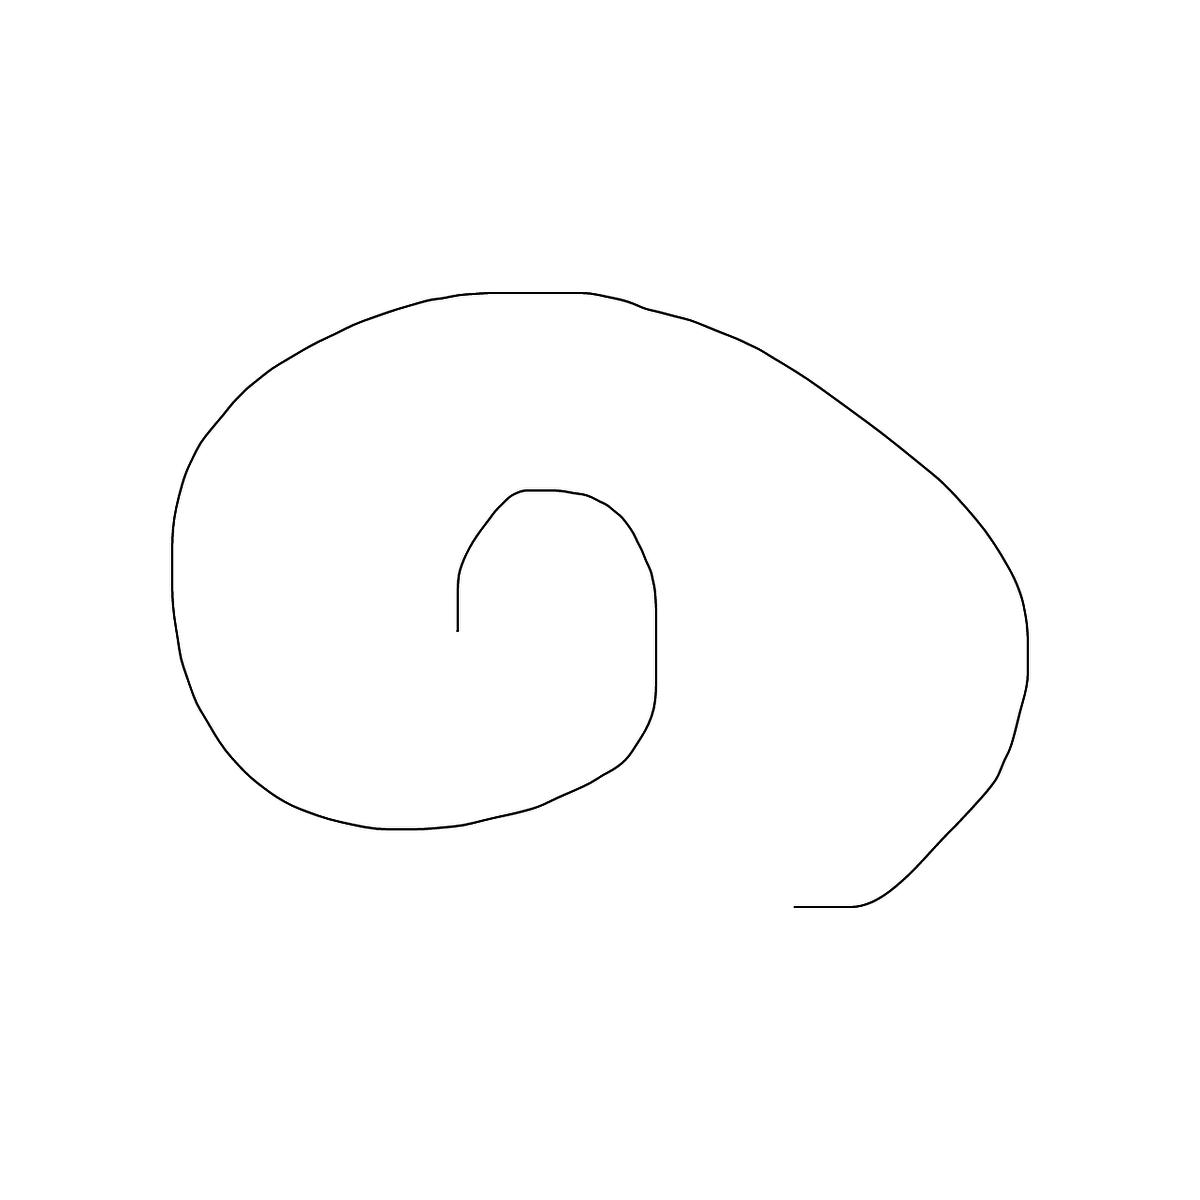 BAAAM drawing#5807 lat:48.8461151123046900lng: 2.3511648178100586